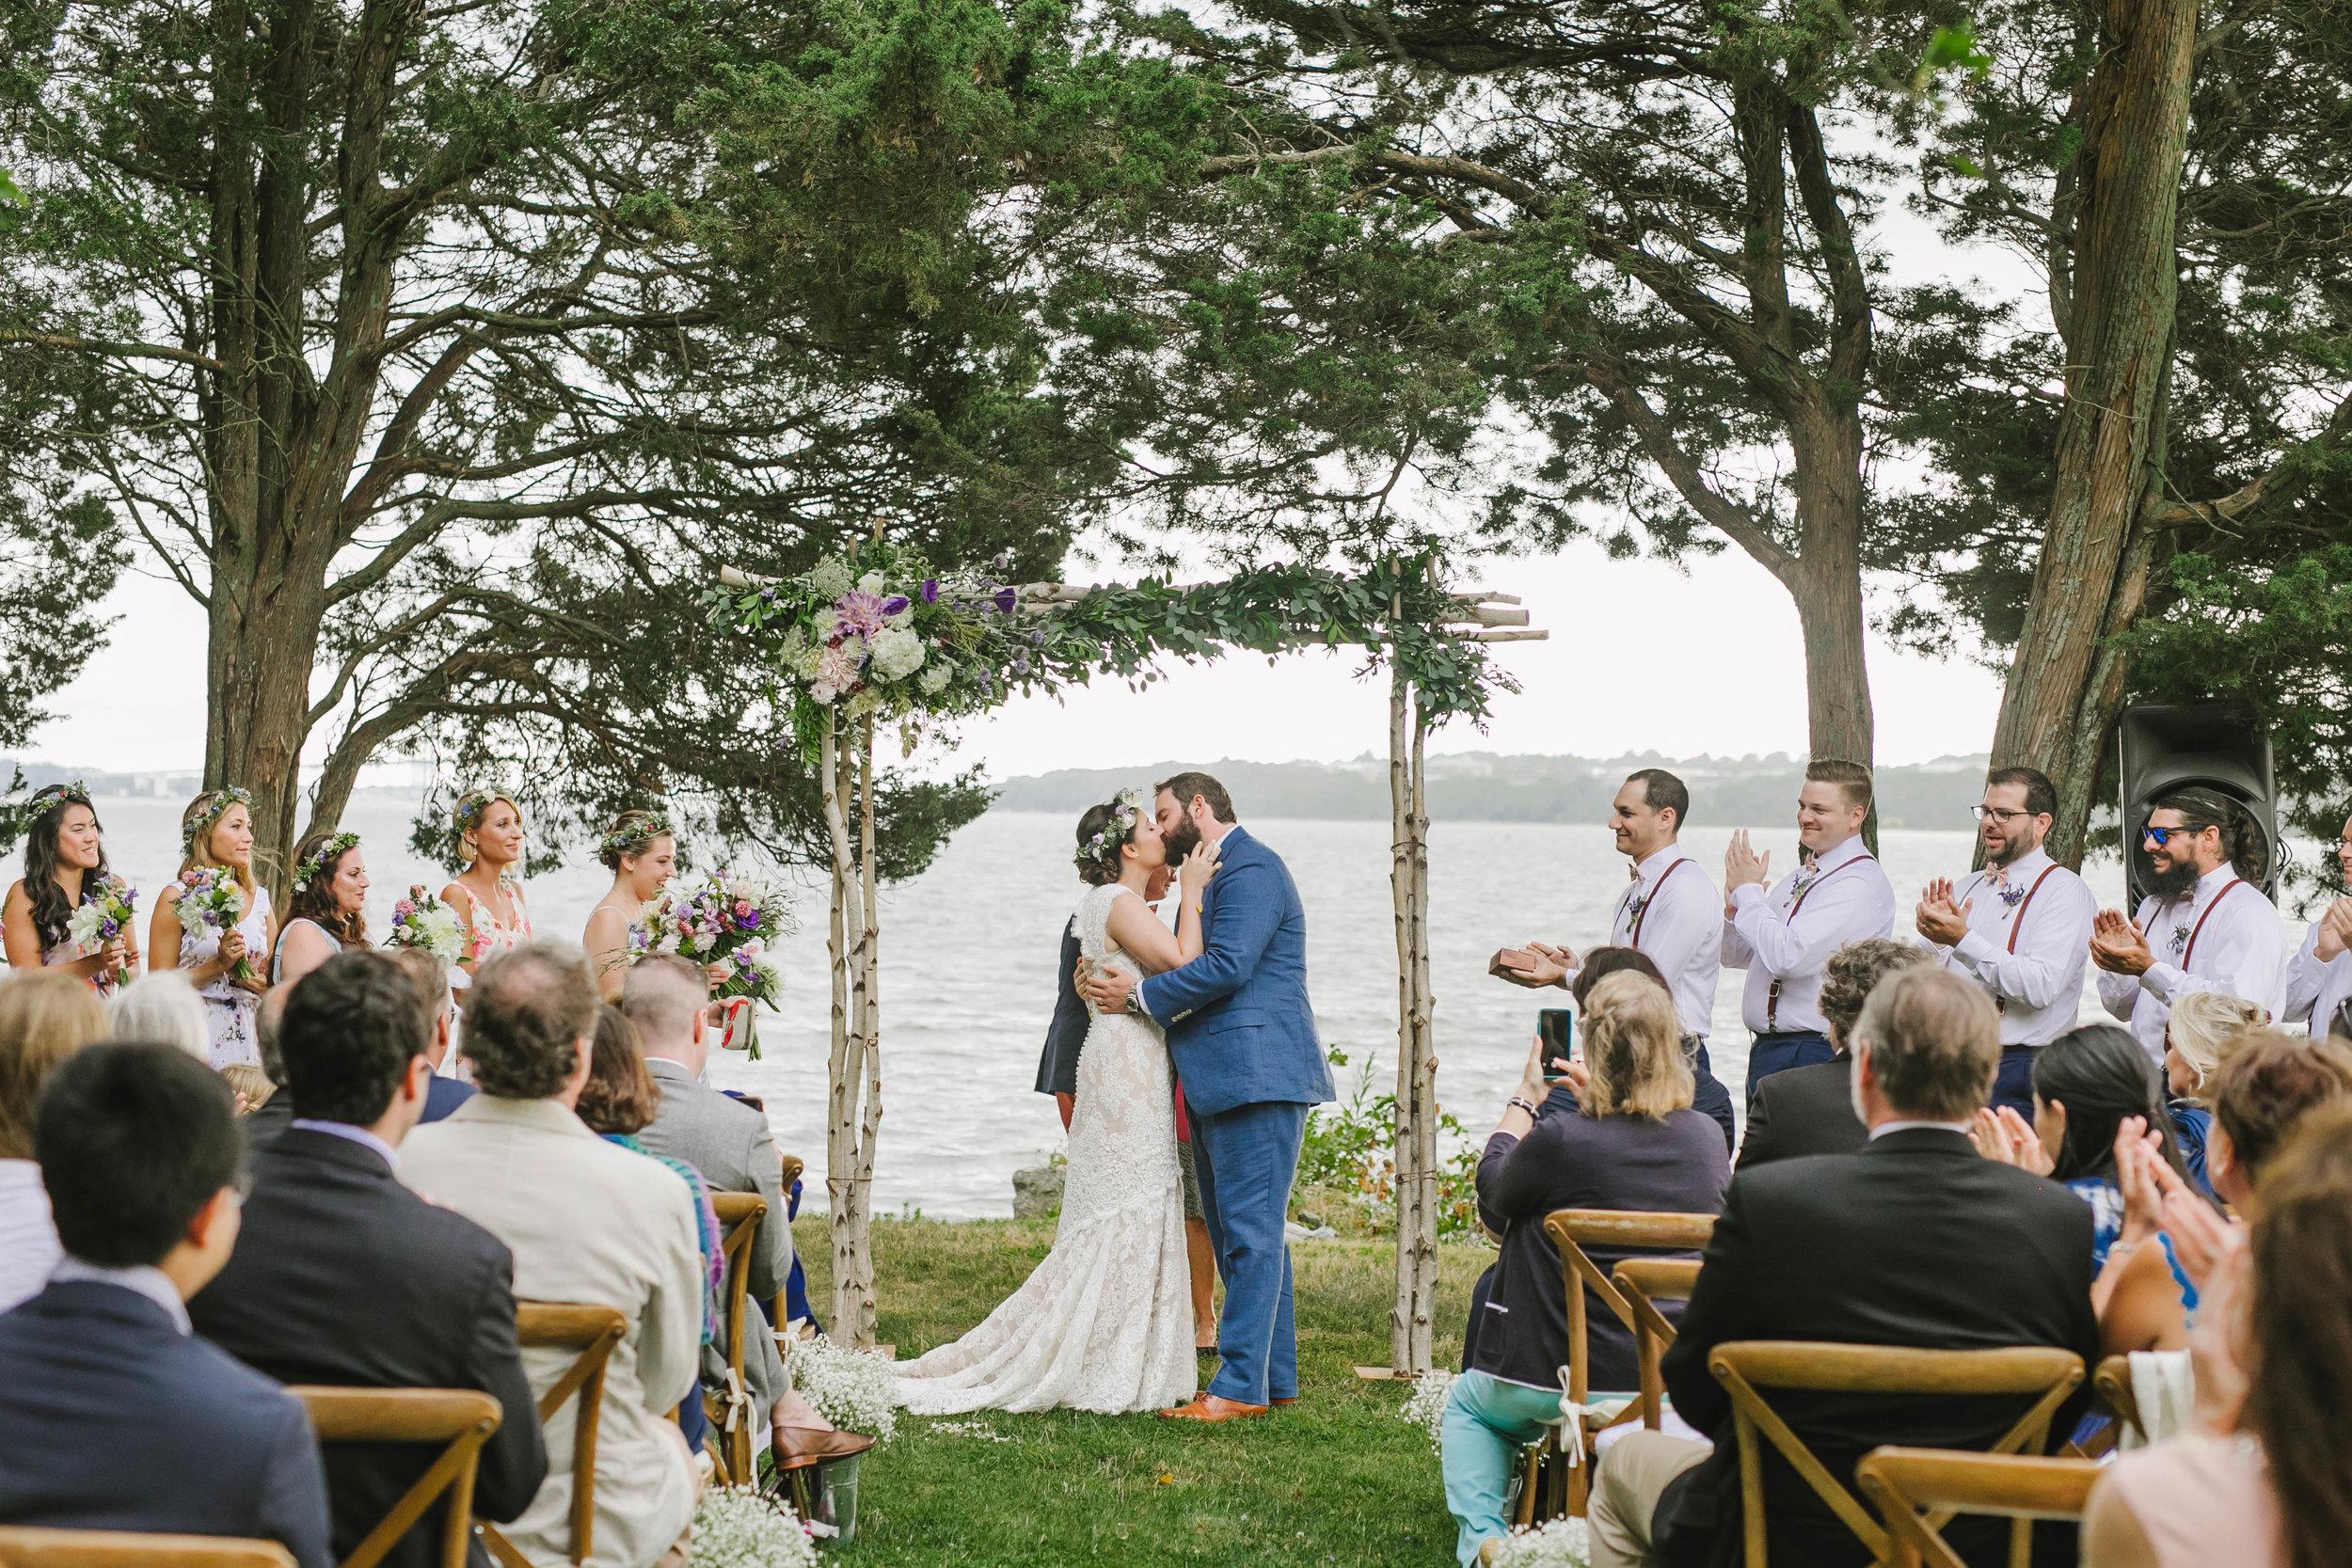 Mount Hope Farm Bristol Rhode Island RI New England Coastal Flower Crown Wedding - Emily Tebbetts Photography-11.jpg